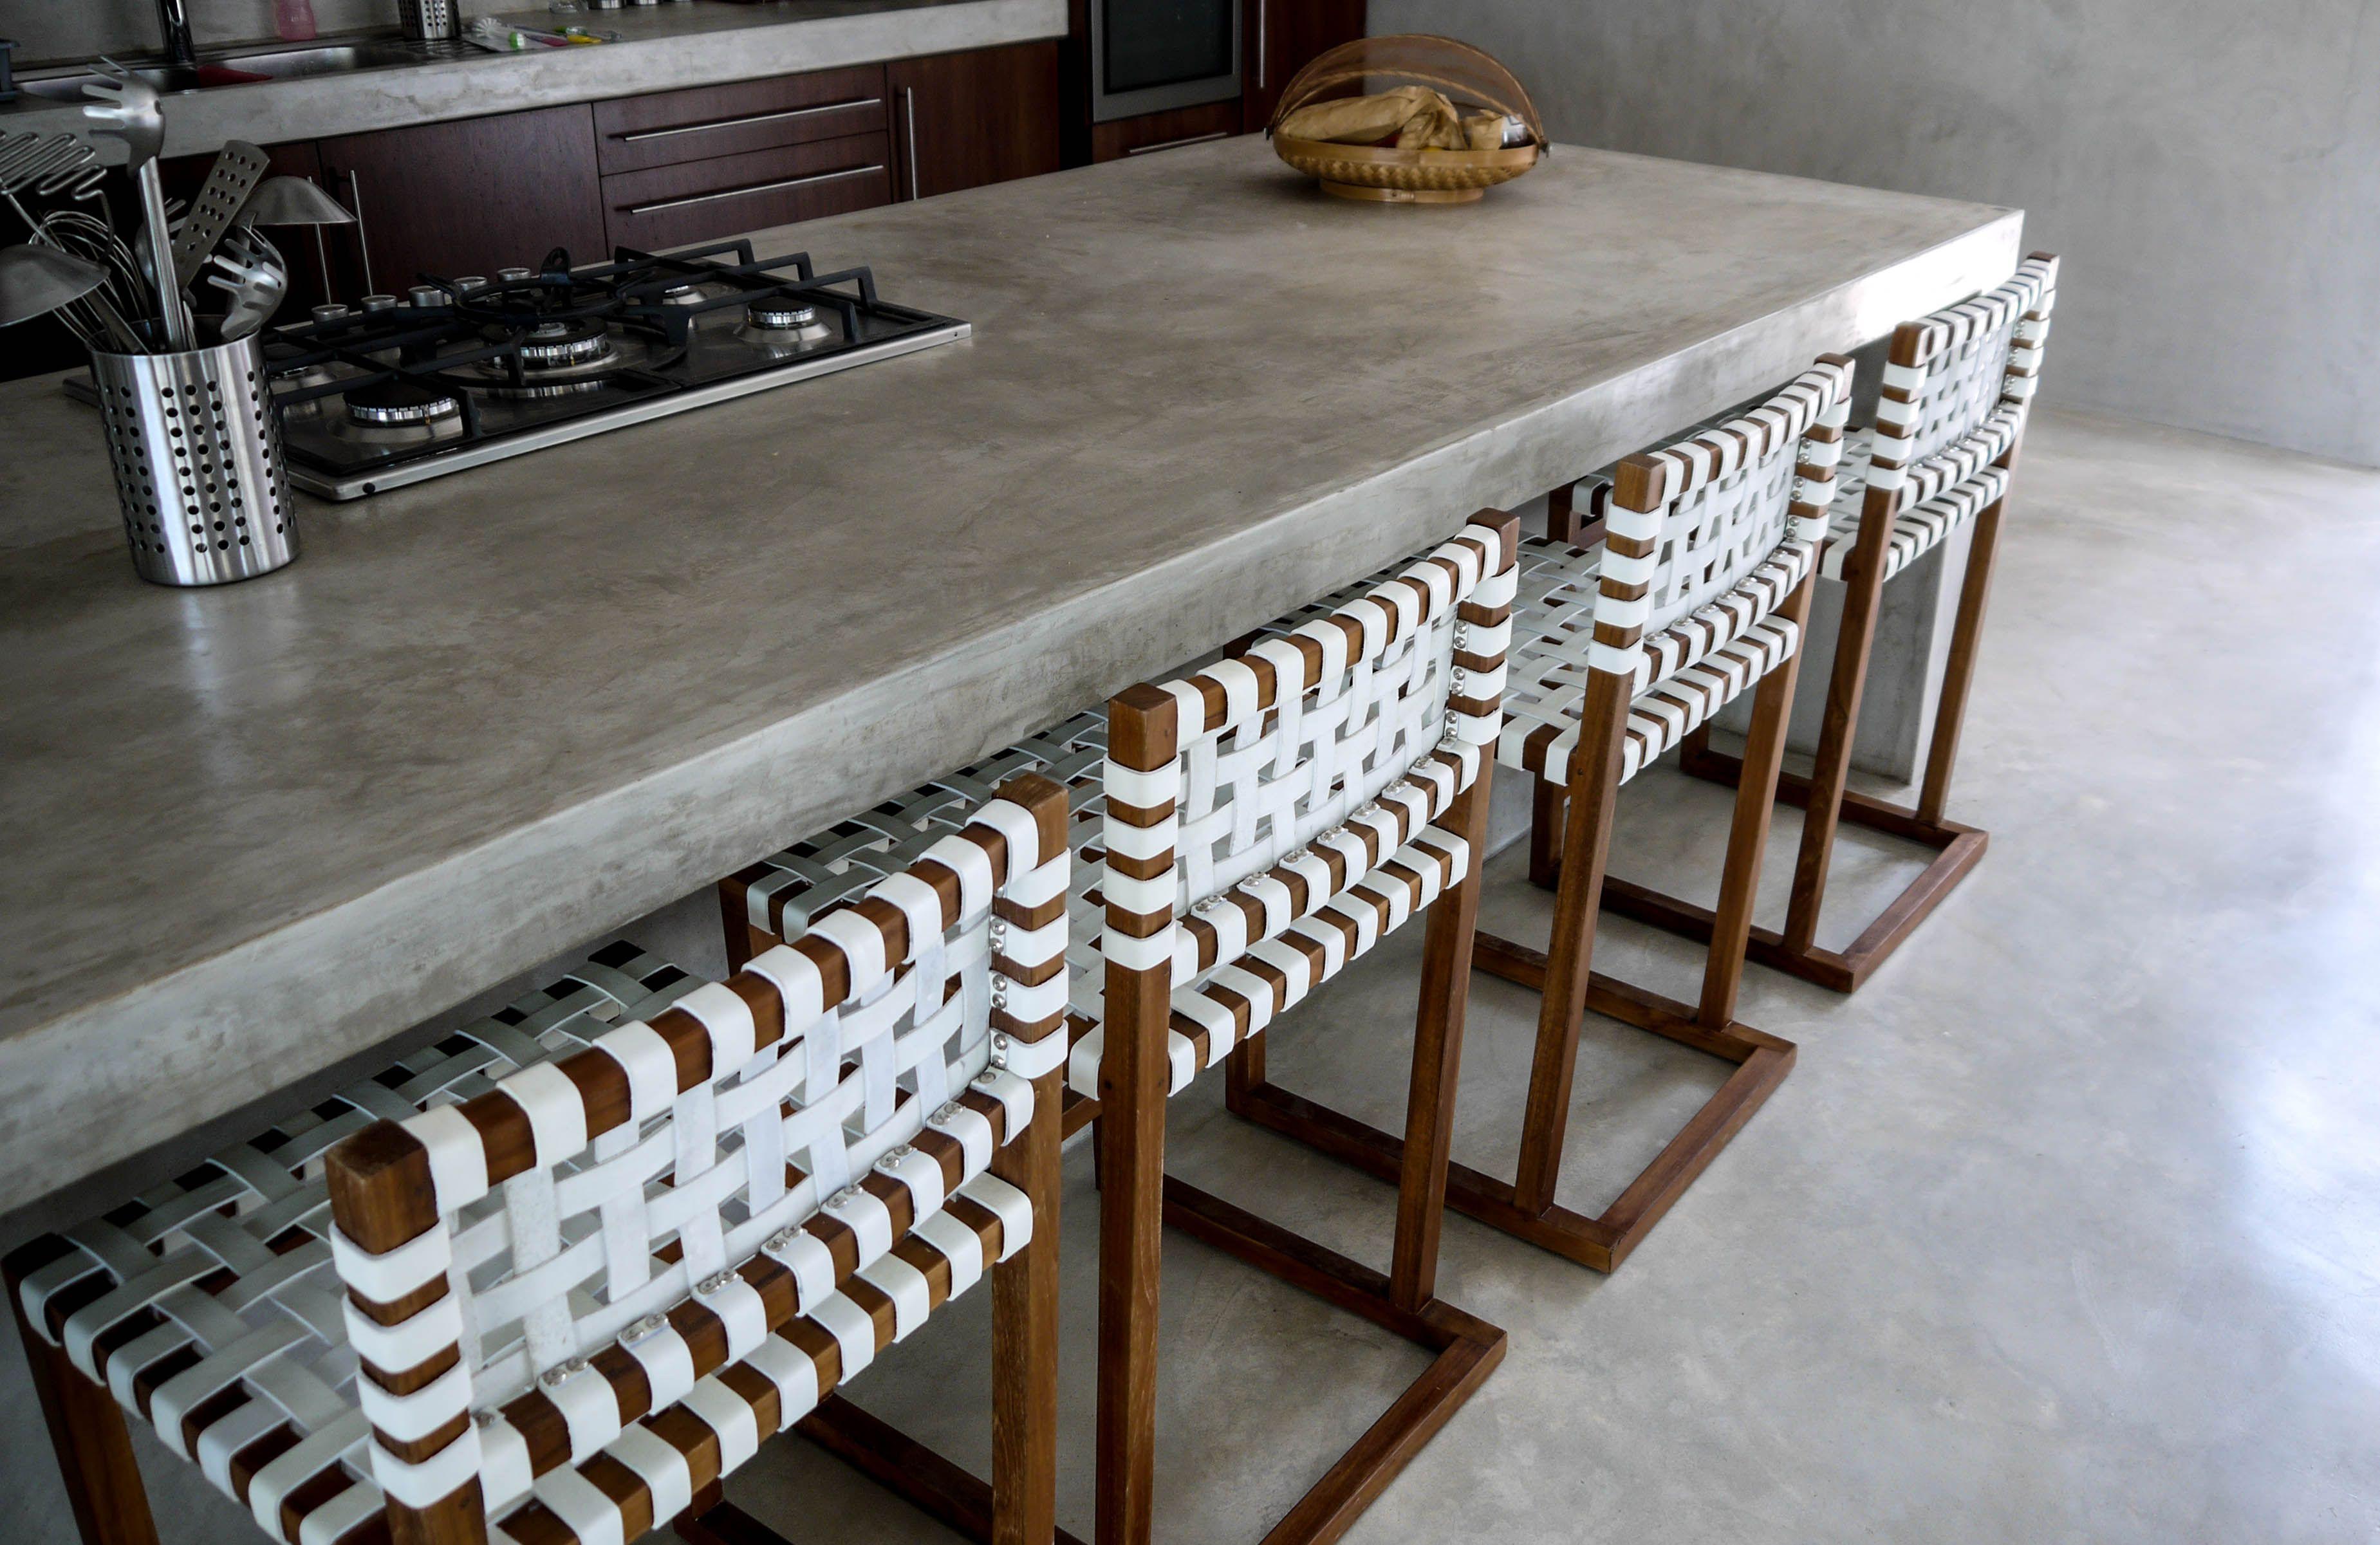 best images about kitchen ideas on pinterest baker furniture